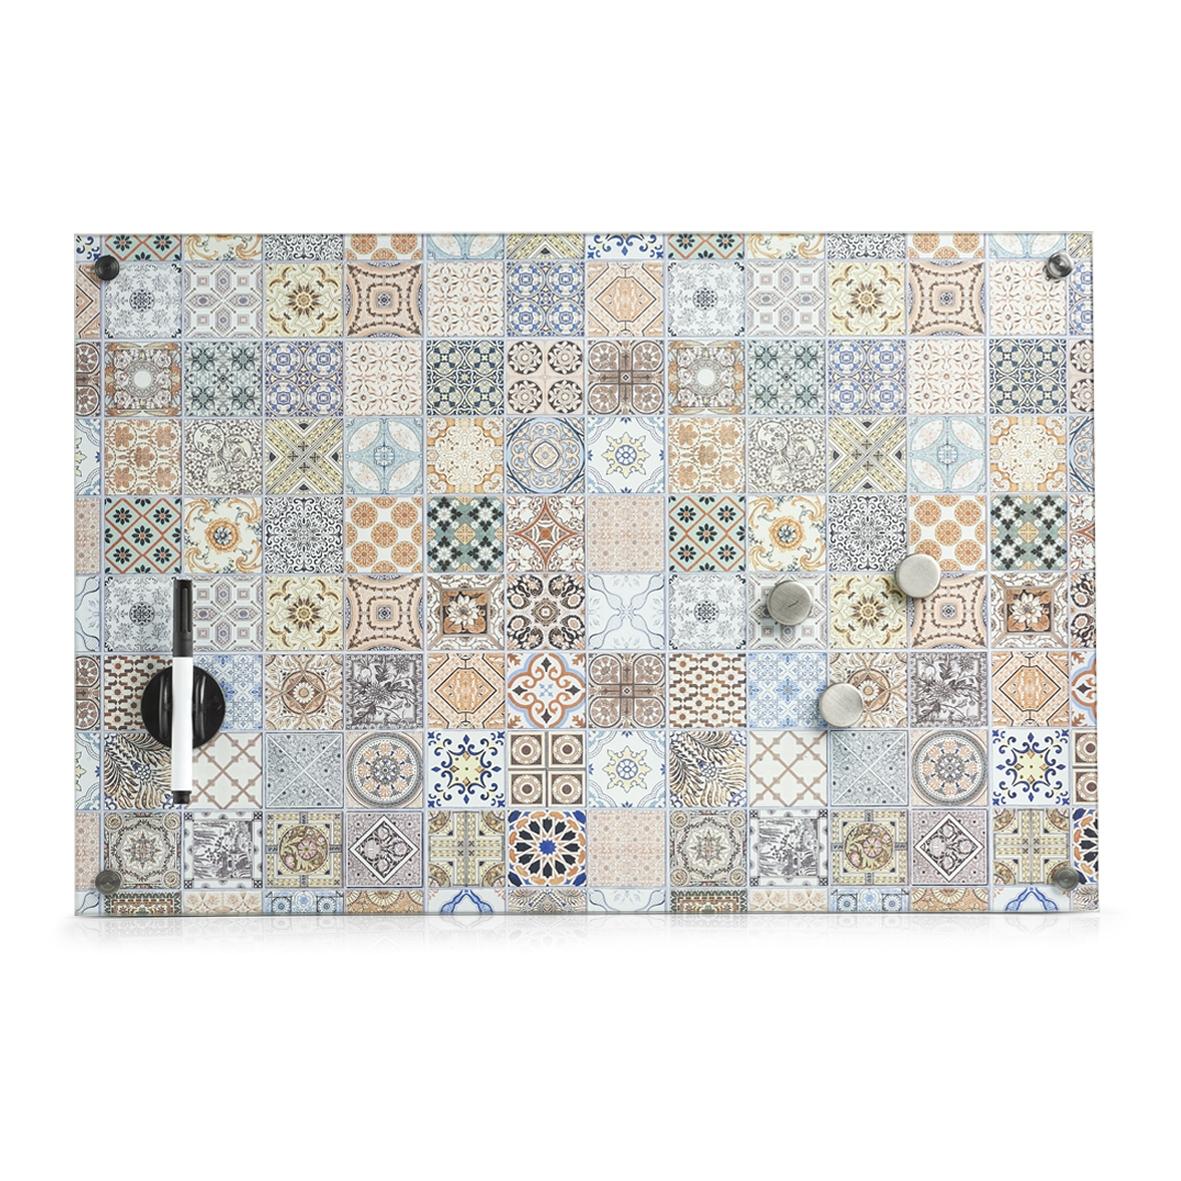 Memo Board din sticla cu 4 accesorii, Mosaic Multicolor, L60xl40 cm imagine